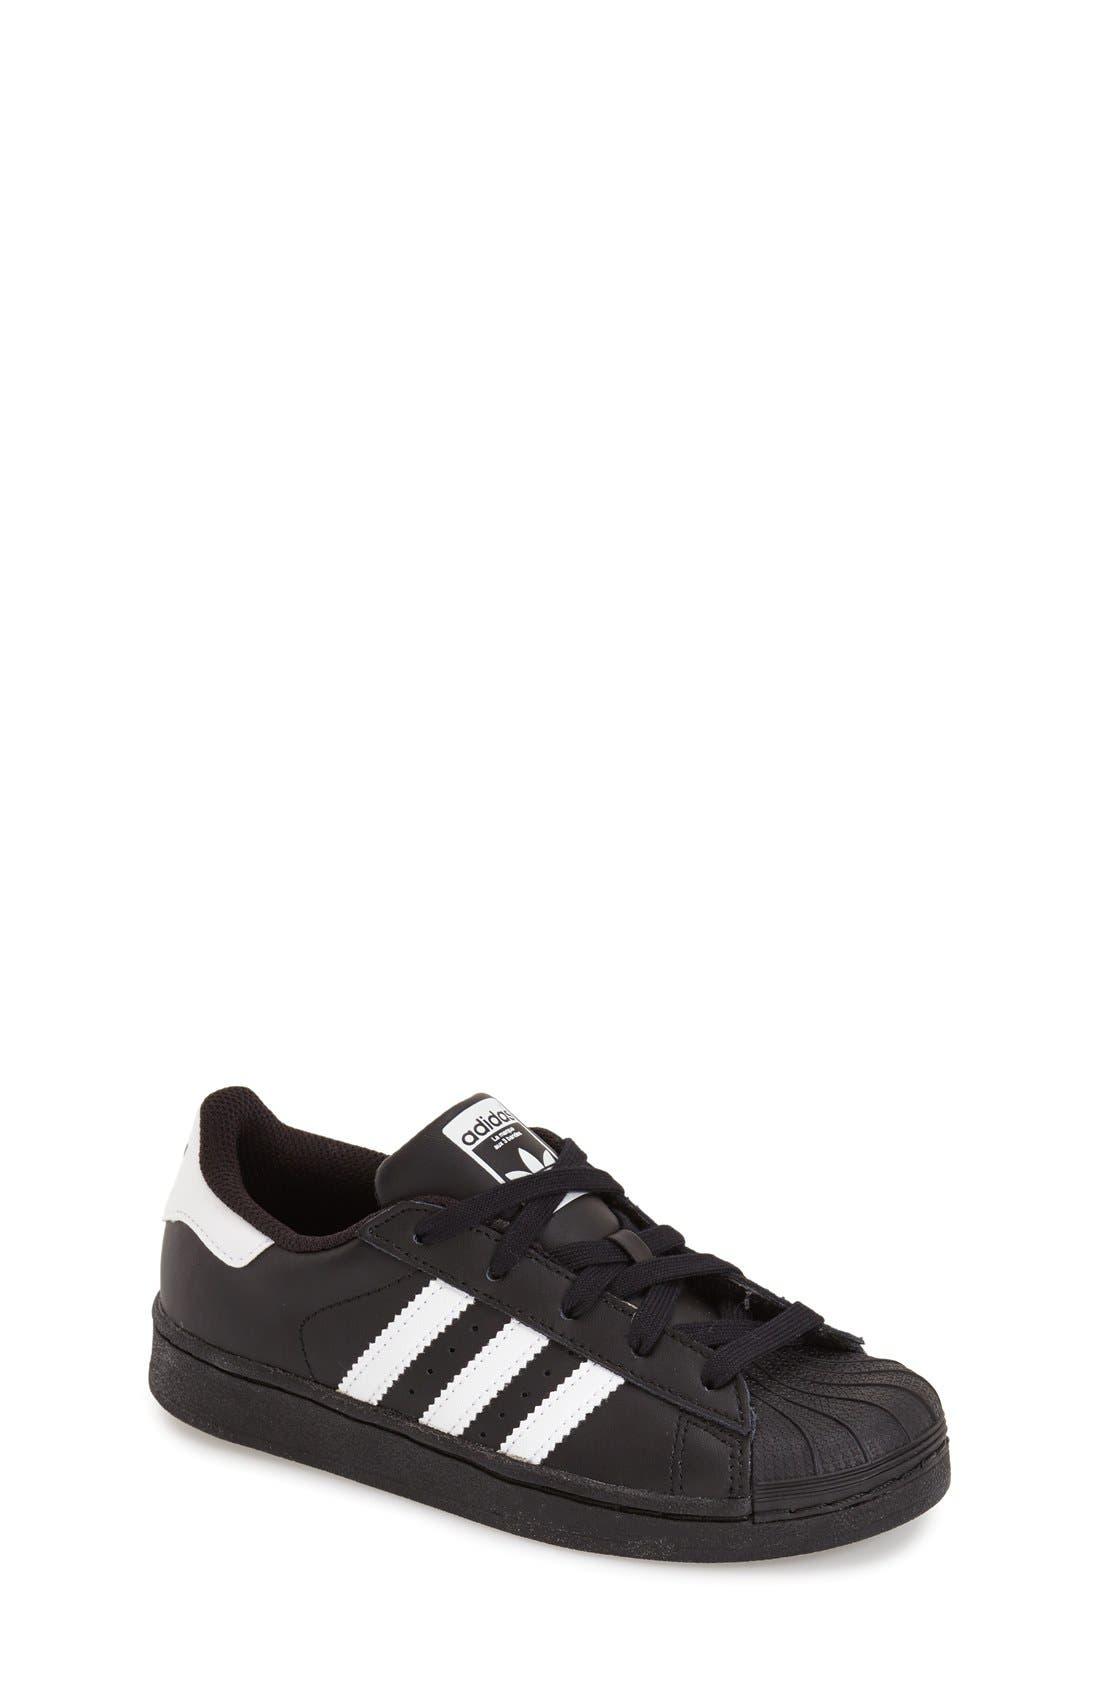 adidas \u0027Superstar\u0027 Sneaker (Baby, Walker, Toddler, Little Kid \u0026 Big